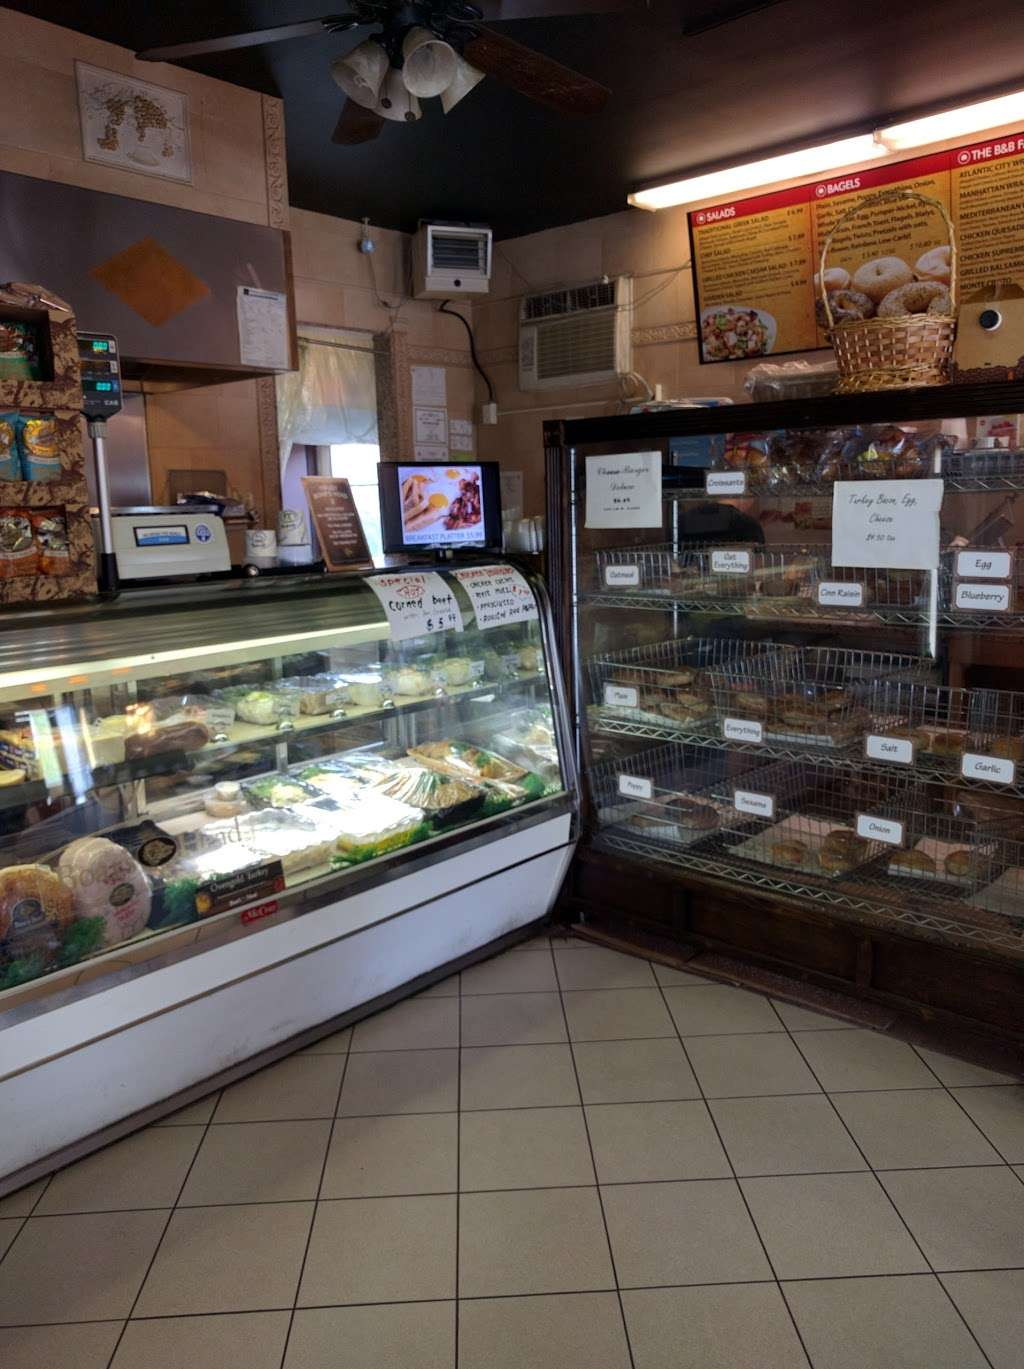 Bagel & Bagel - bakery  | Photo 4 of 9 | Address: 775 Edgewater Ave, Ridgefield, NJ 07657, USA | Phone: (201) 941-5626